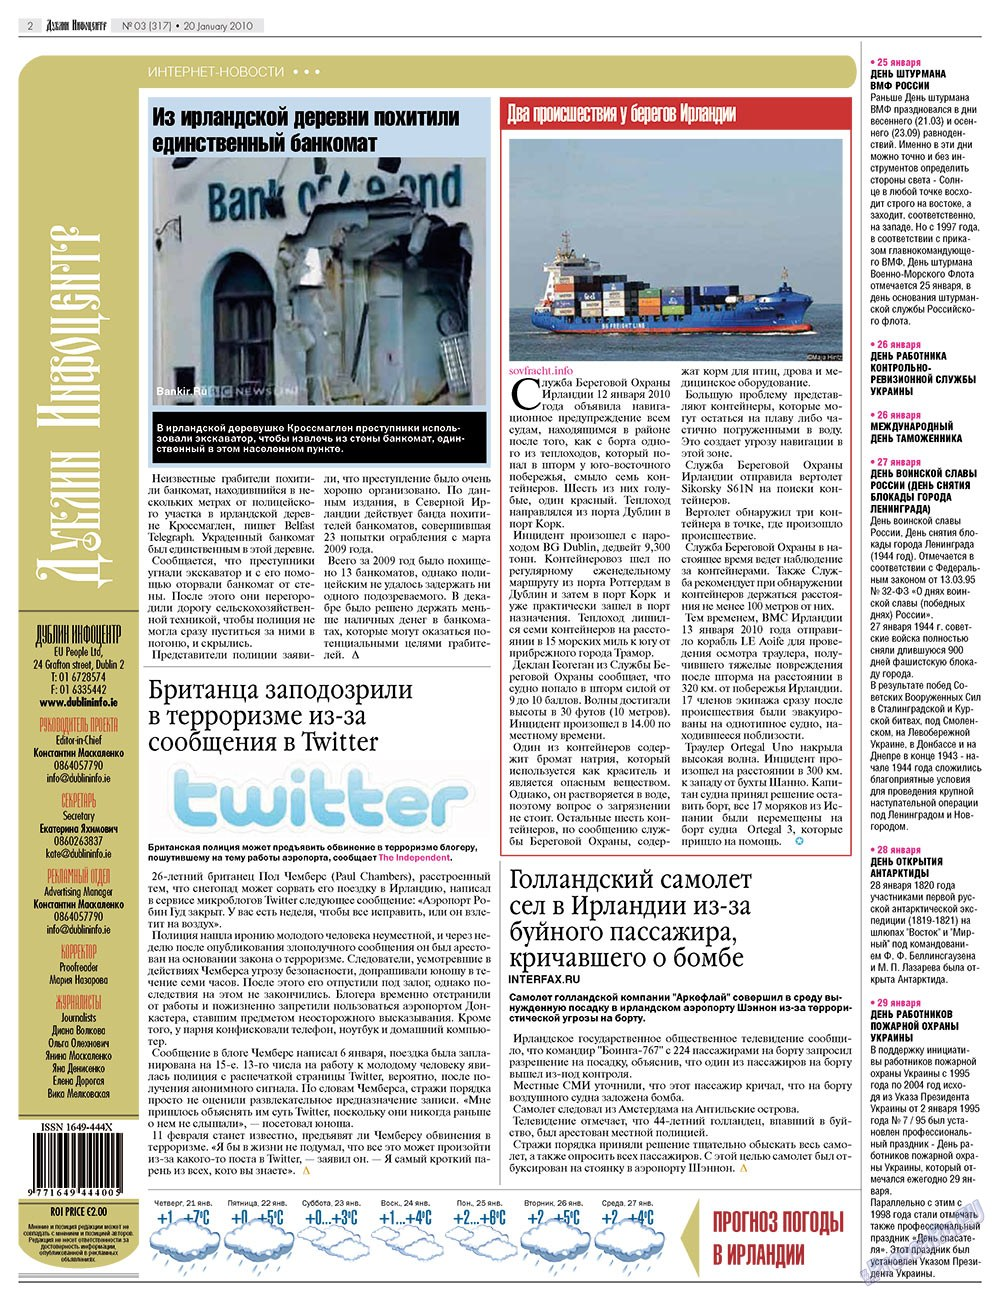 Дублин инфоцентр (газета). 2010 год, номер 3, стр. 2